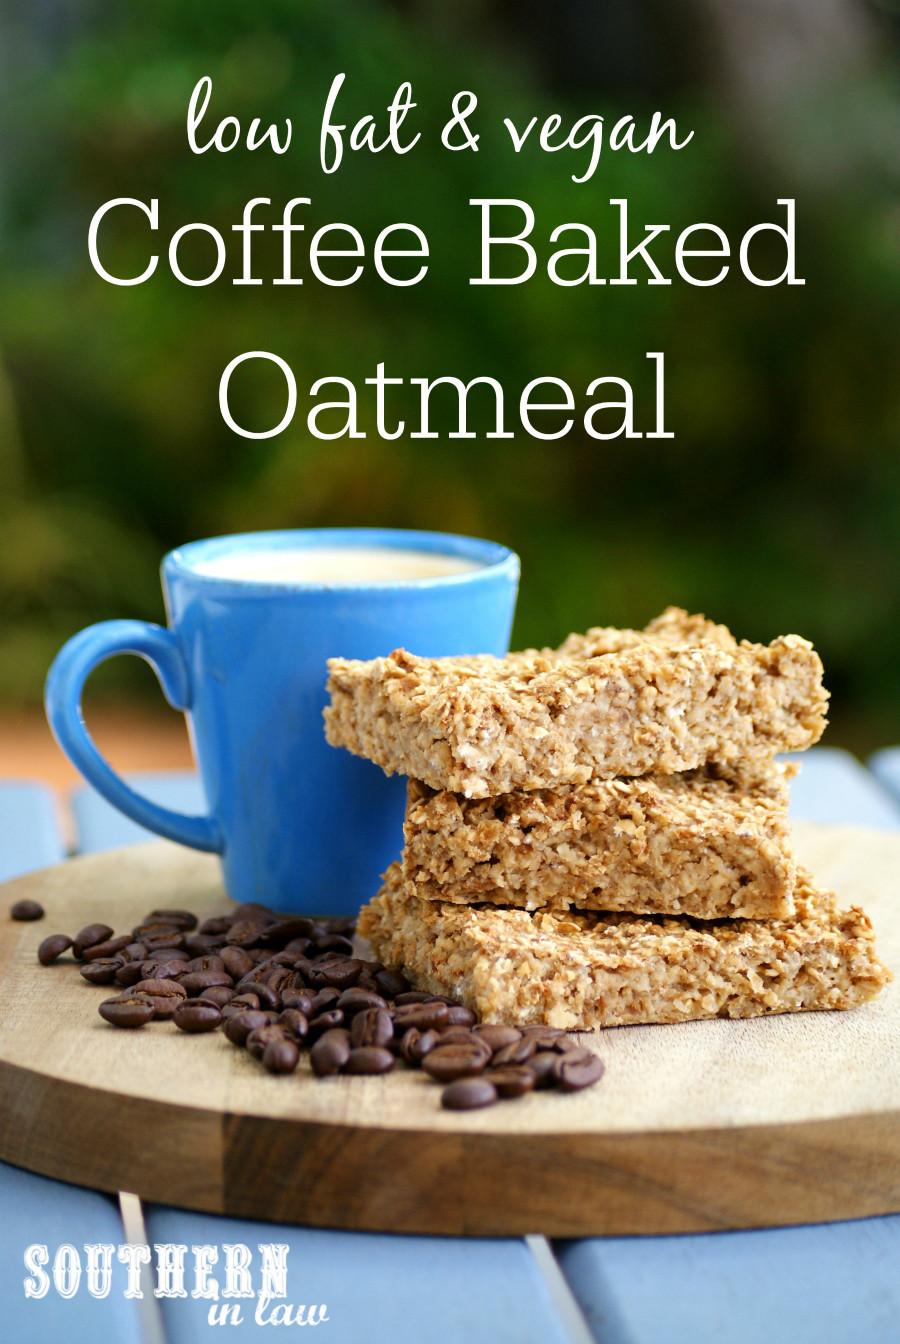 Vegan Coffee Recipes  Southern In Law Recipe Coffee Baked Oatmeal Vegan